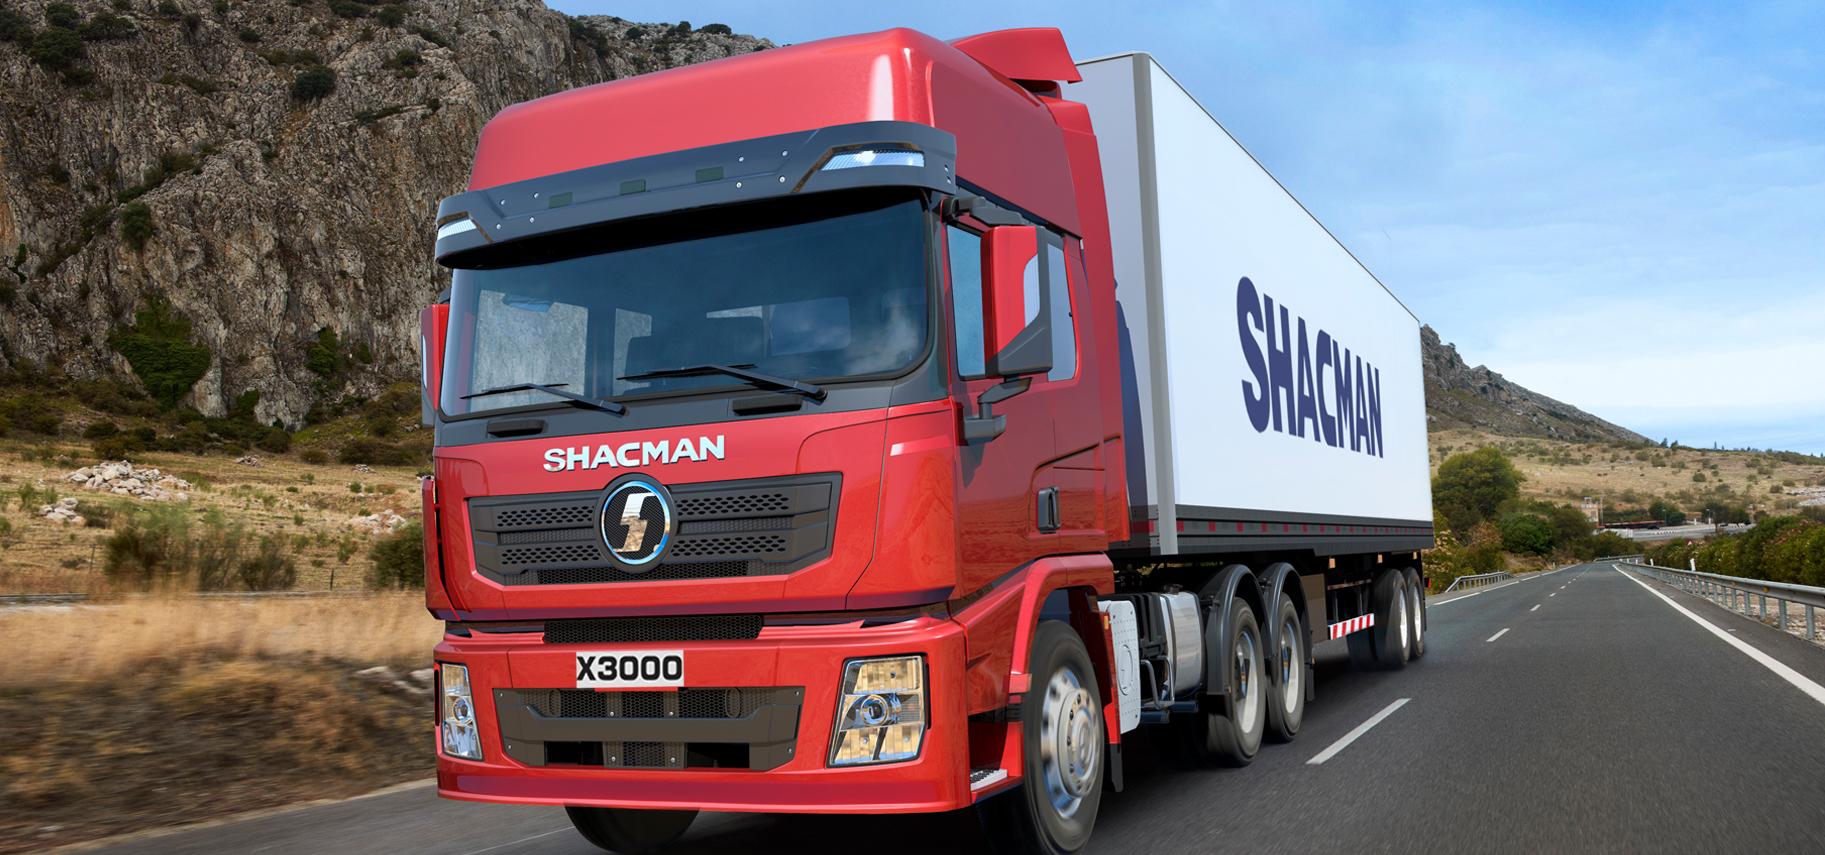 Shacman truck X3000